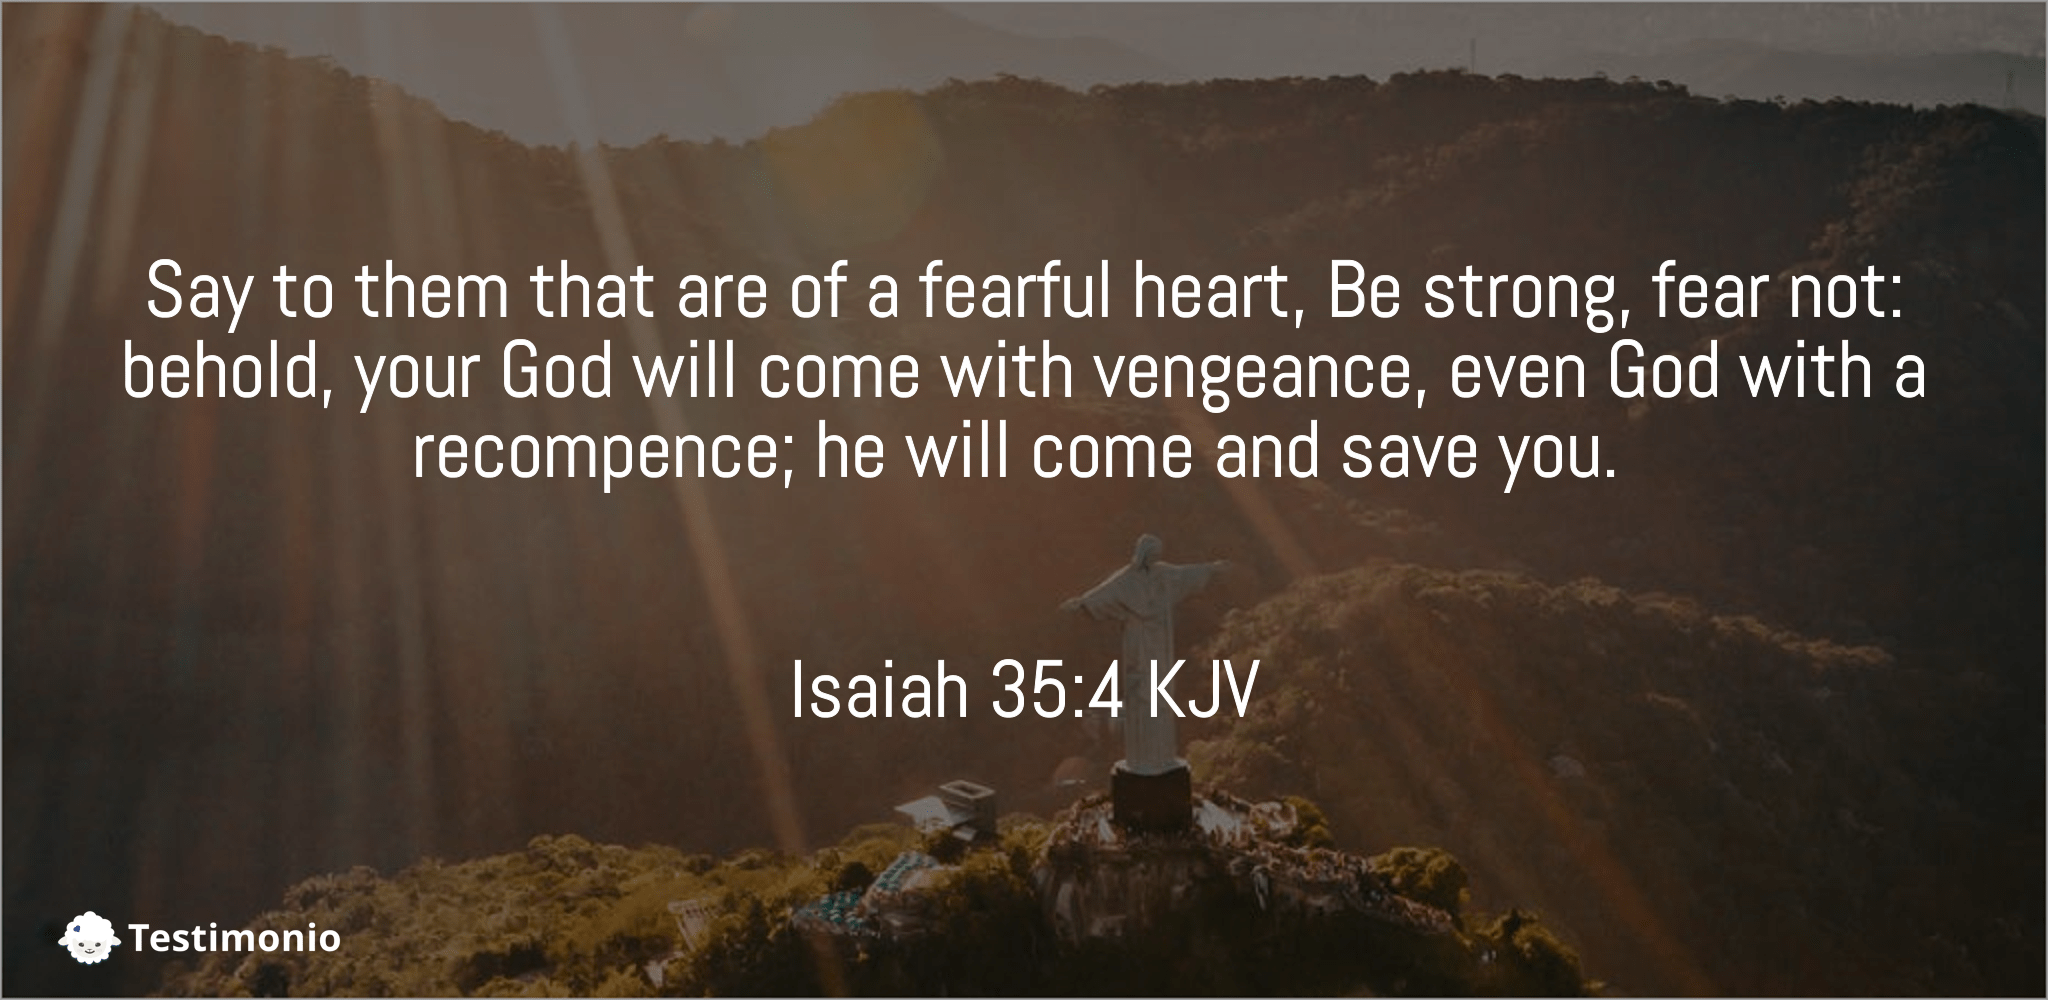 Isaiah 35:4